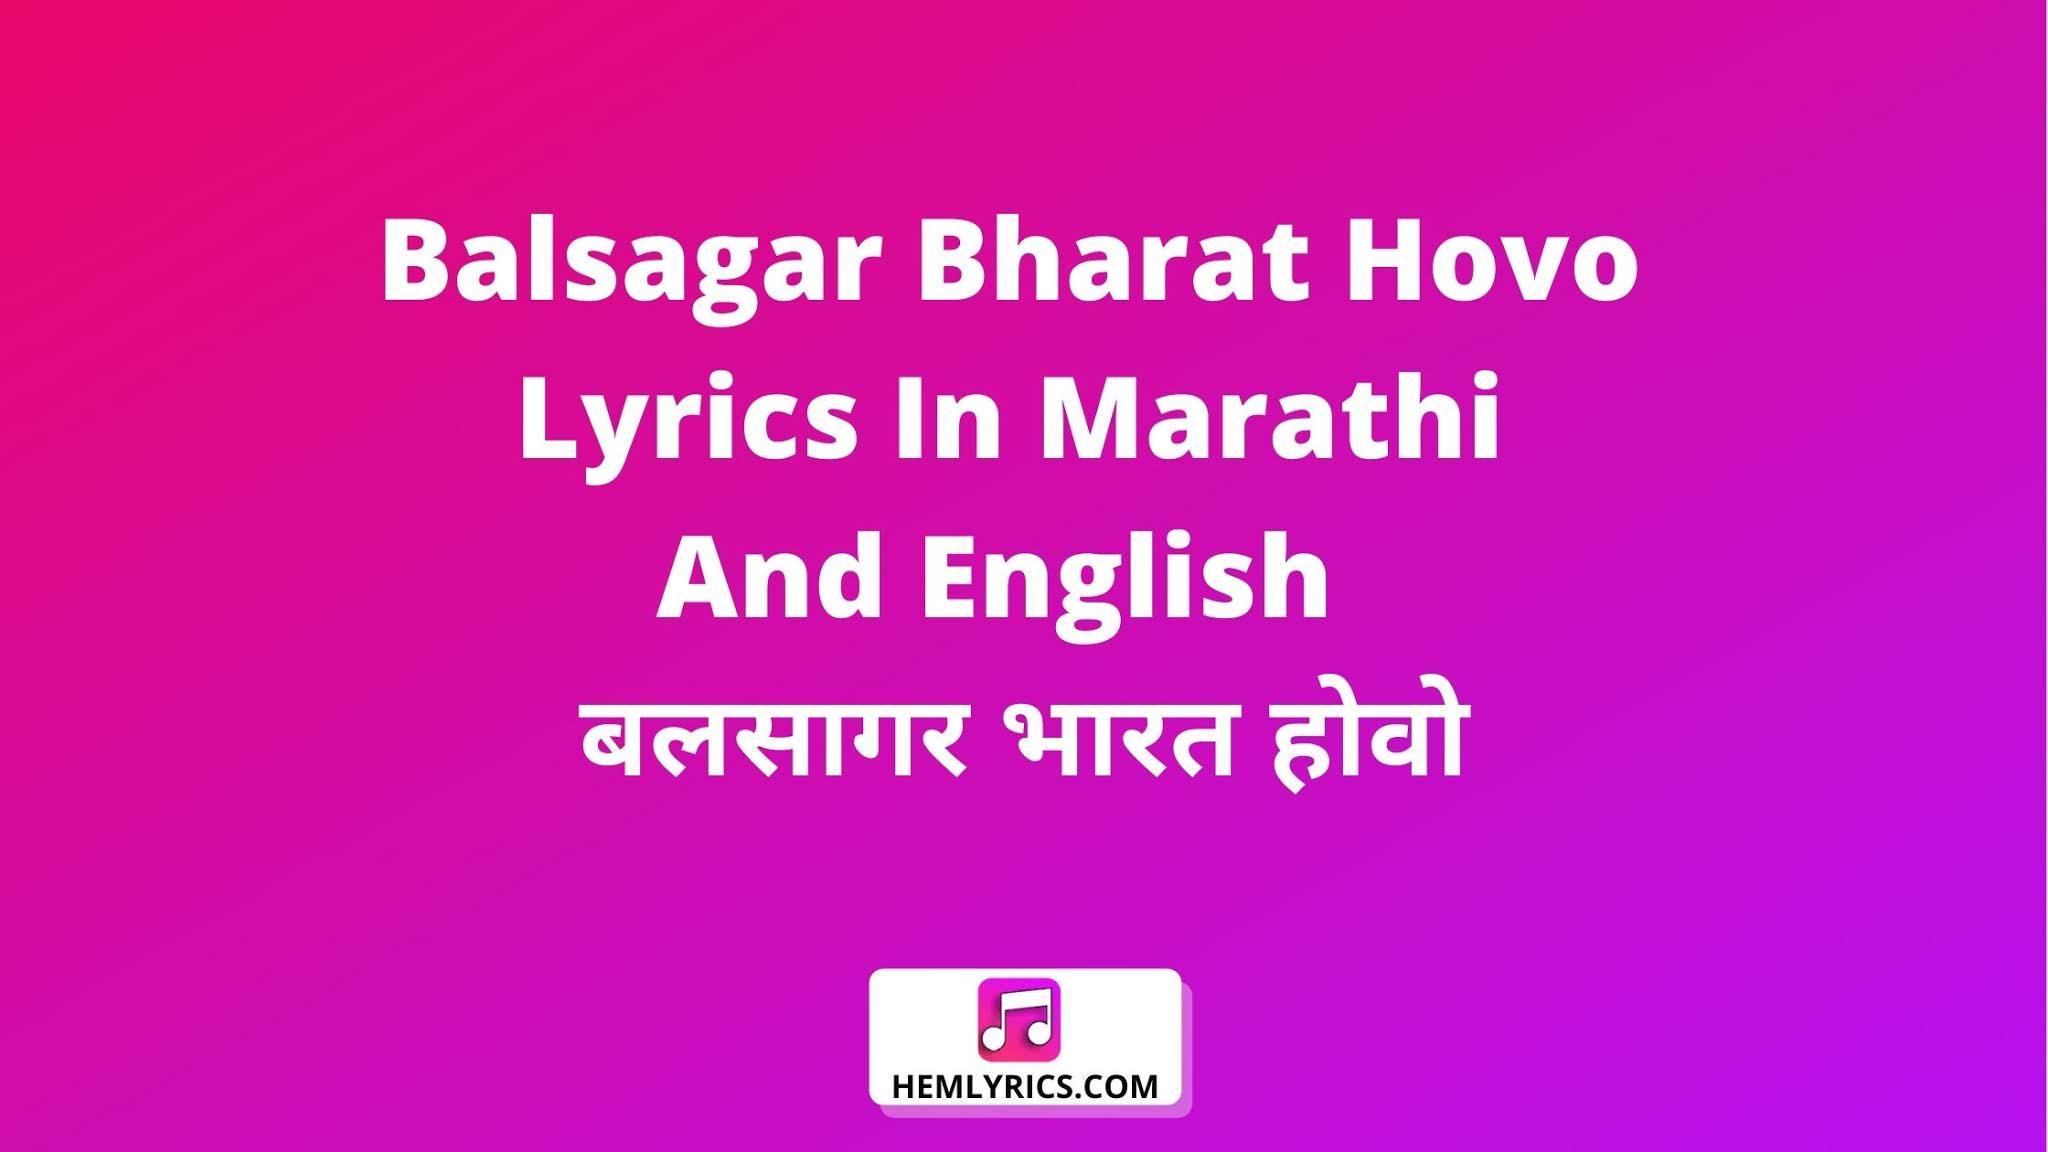 Balsagar Bharat Hovo Lyrics In Marathi And English